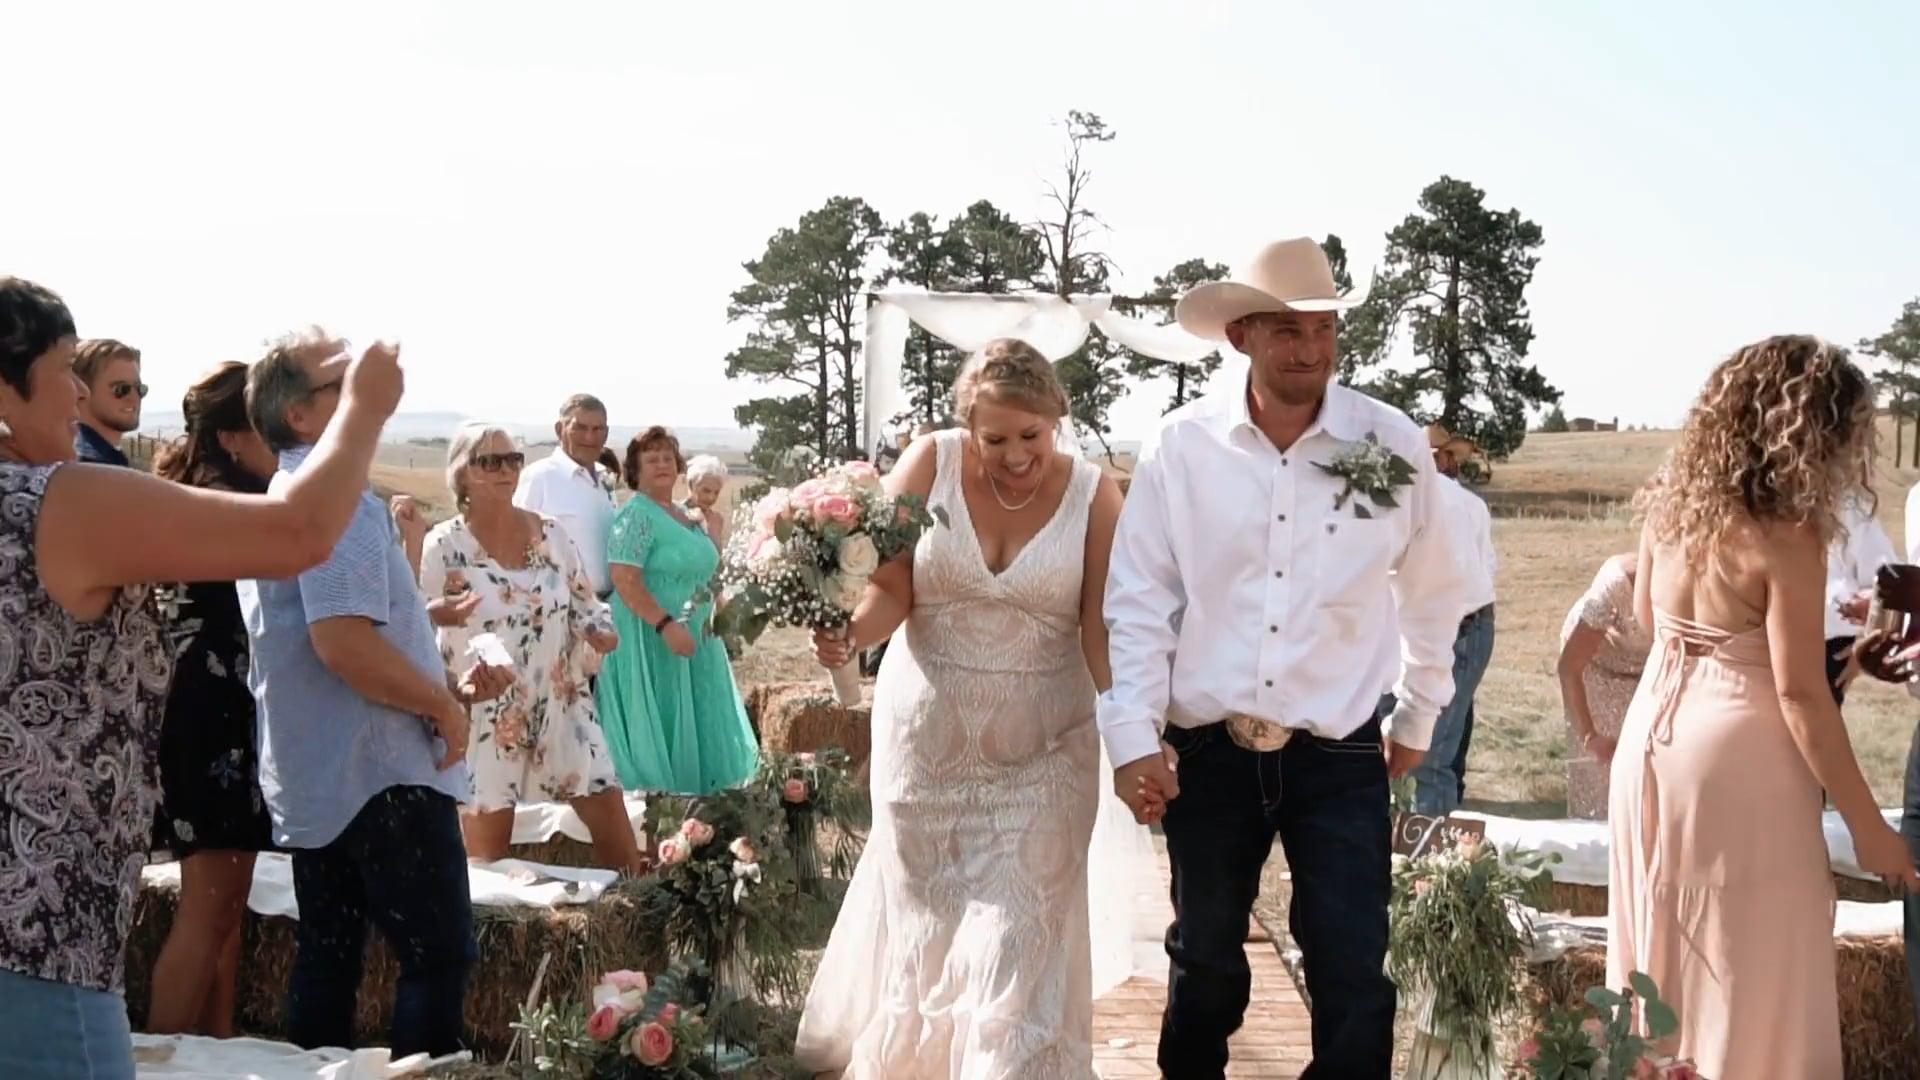 Mikinsie & Dustin's Colorado Springs Wedding Ceremony